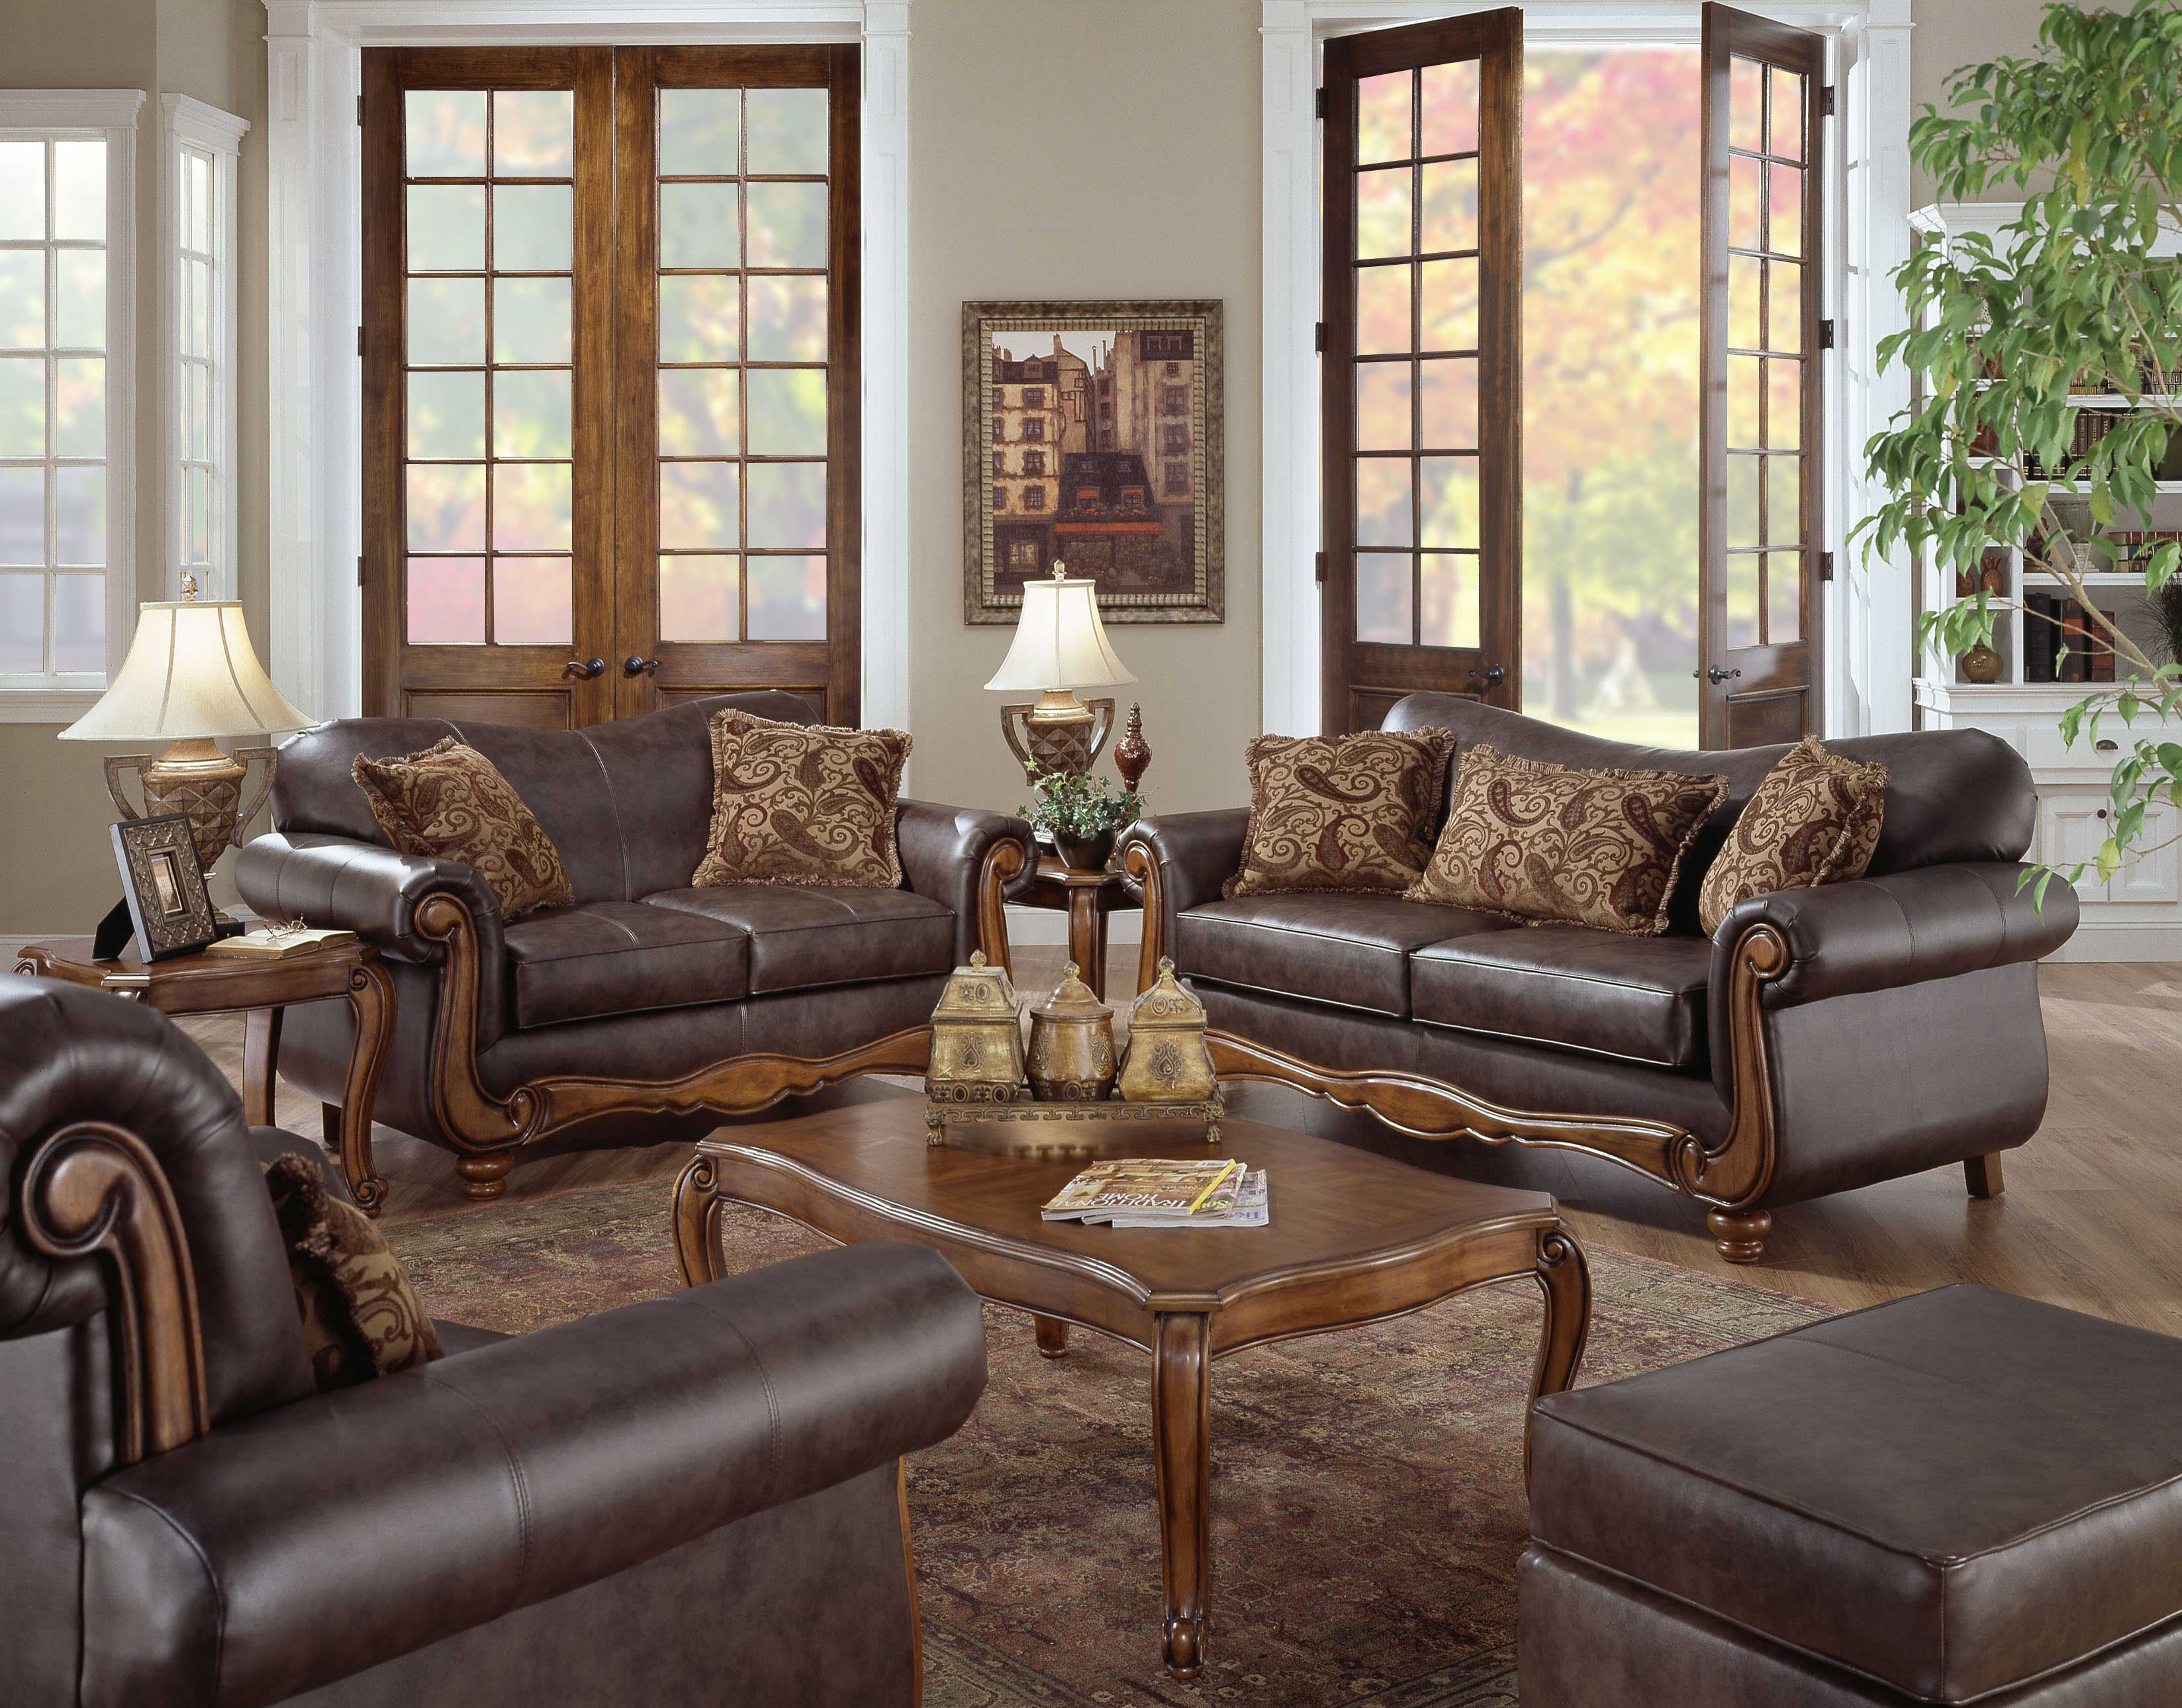 Cheap Living Room Sets Under $500 | Roy Home Design